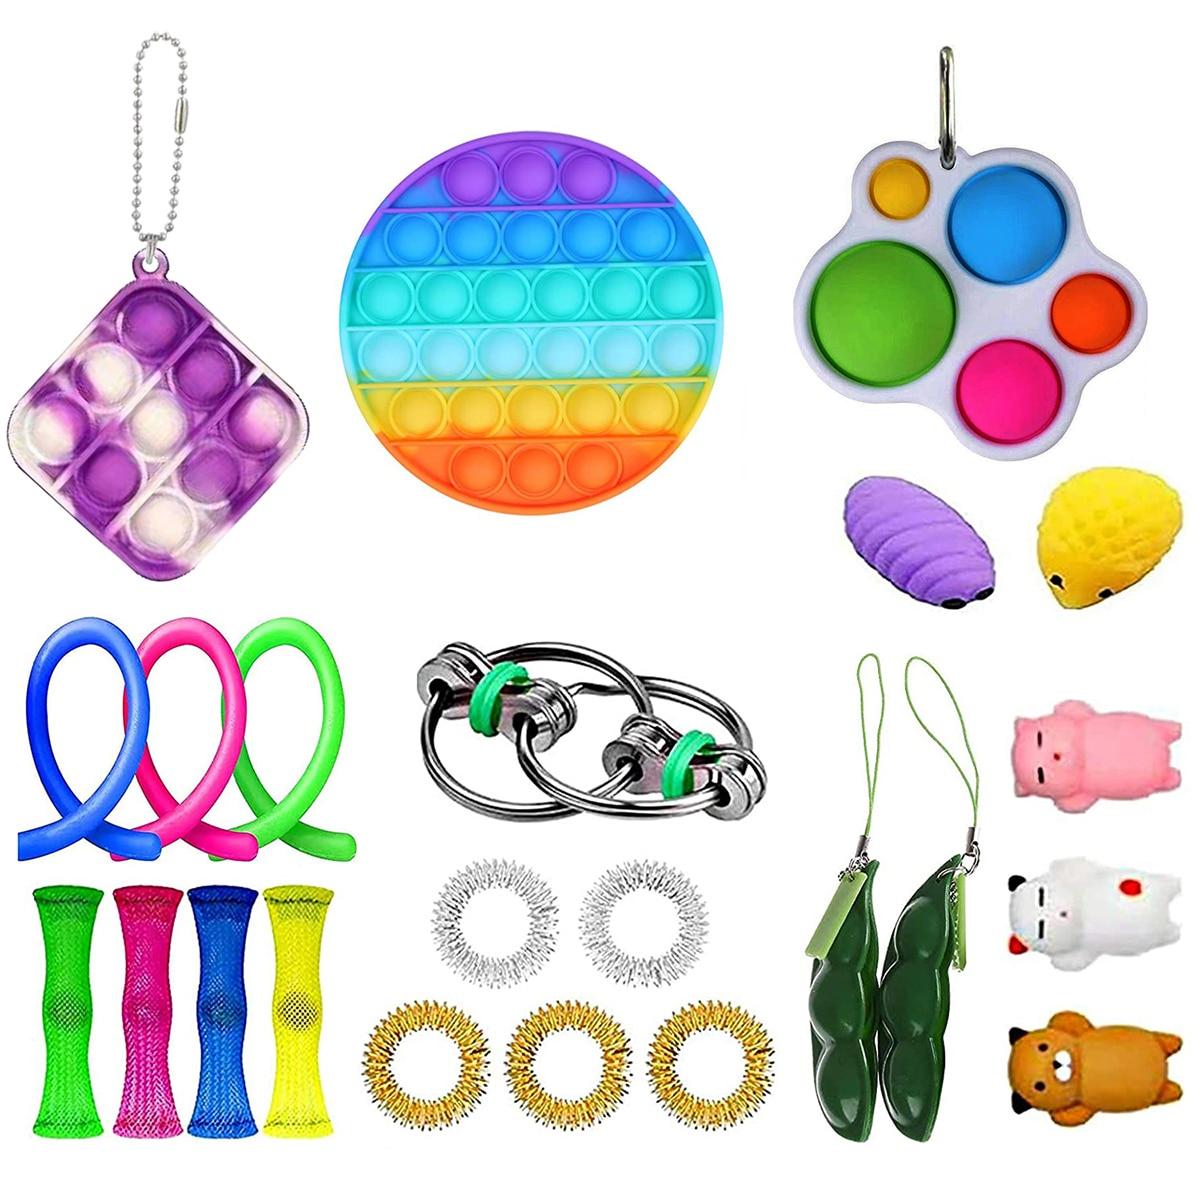 Toys-Set Fidget-Toys Decompression-Sensory Fun Squeeze Bubble Children's Cartoon Board-Game img5